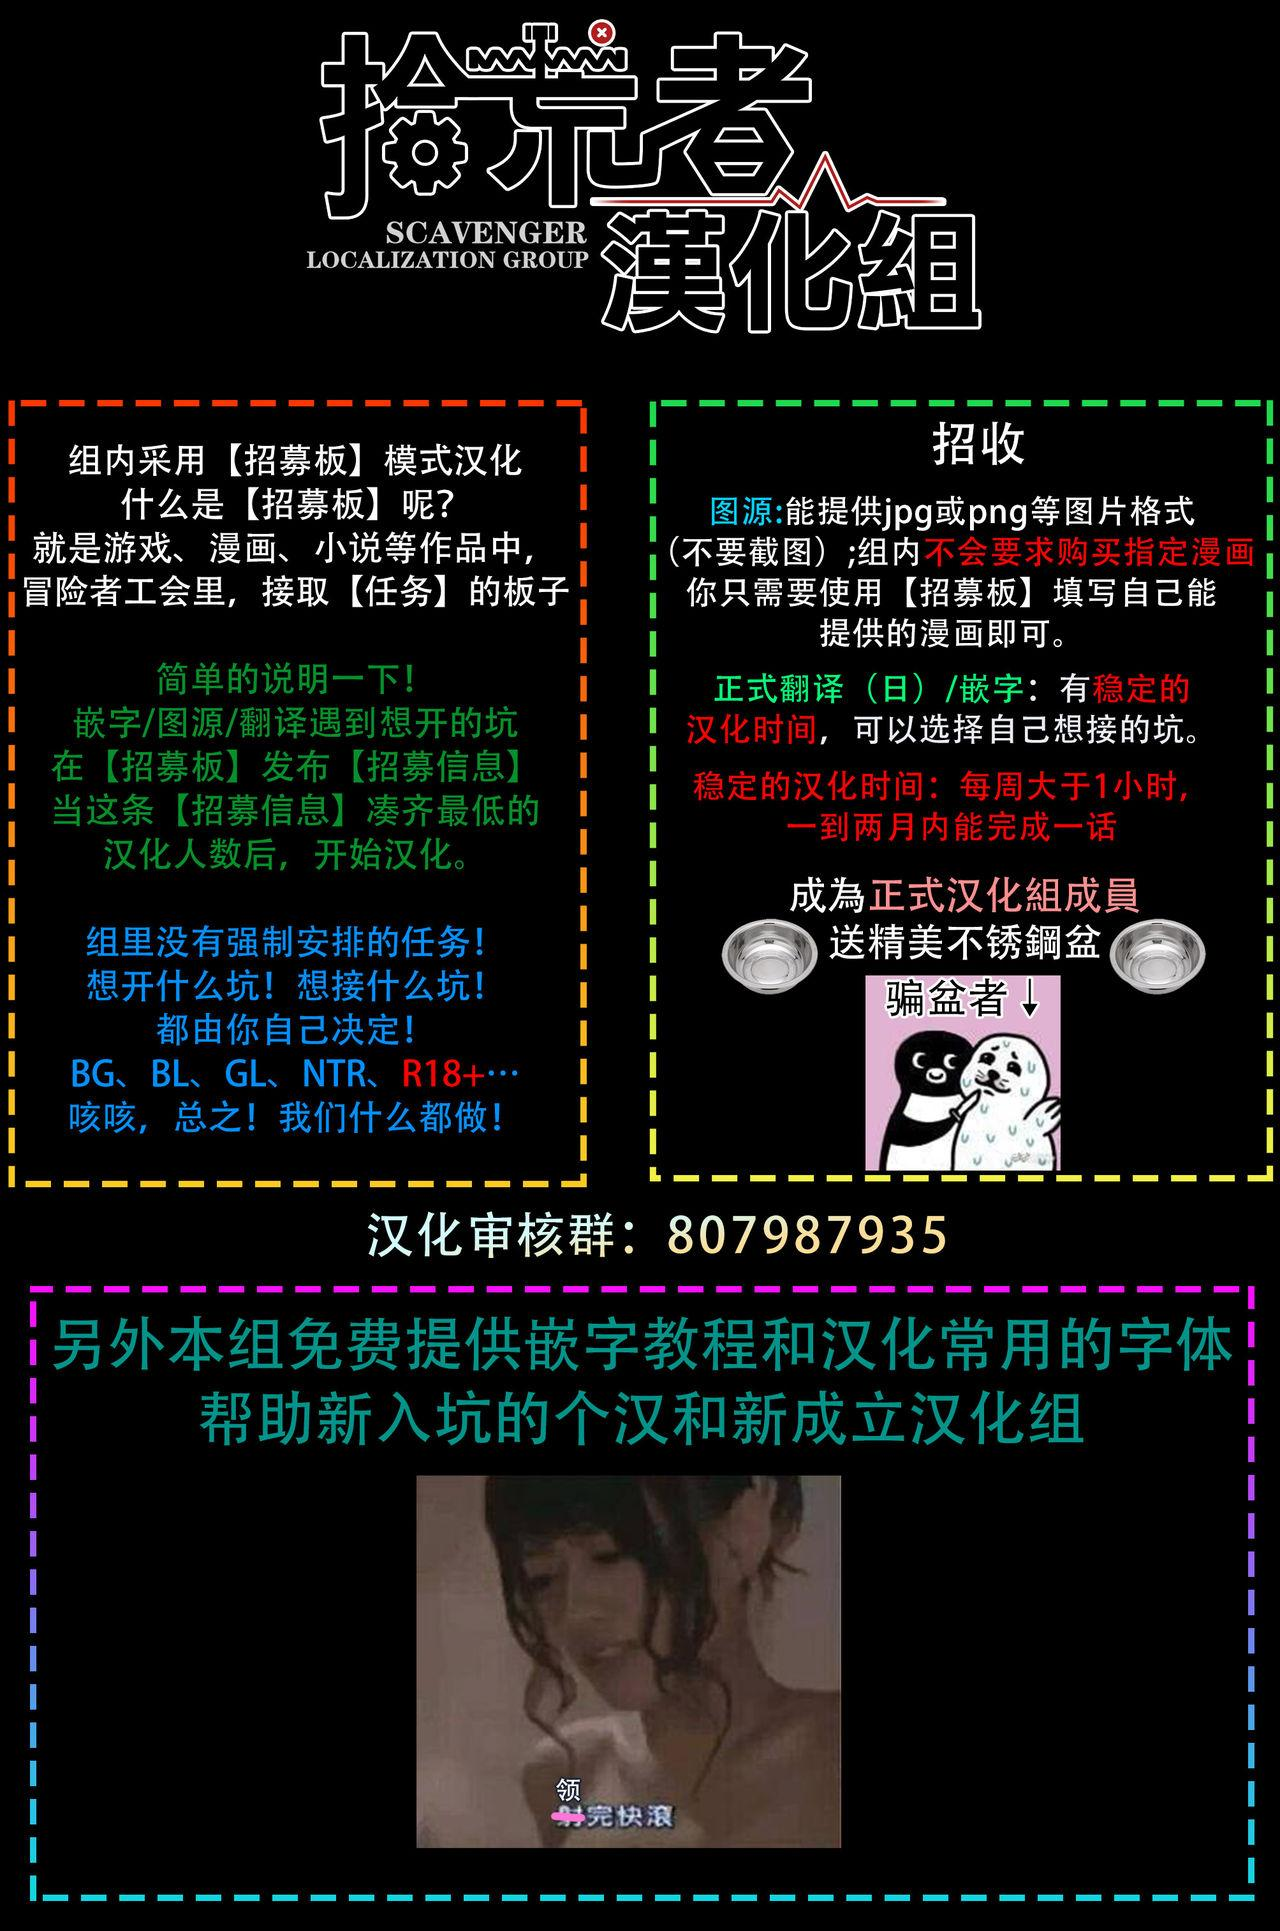 龙虎搏爱 01 Chinese 31